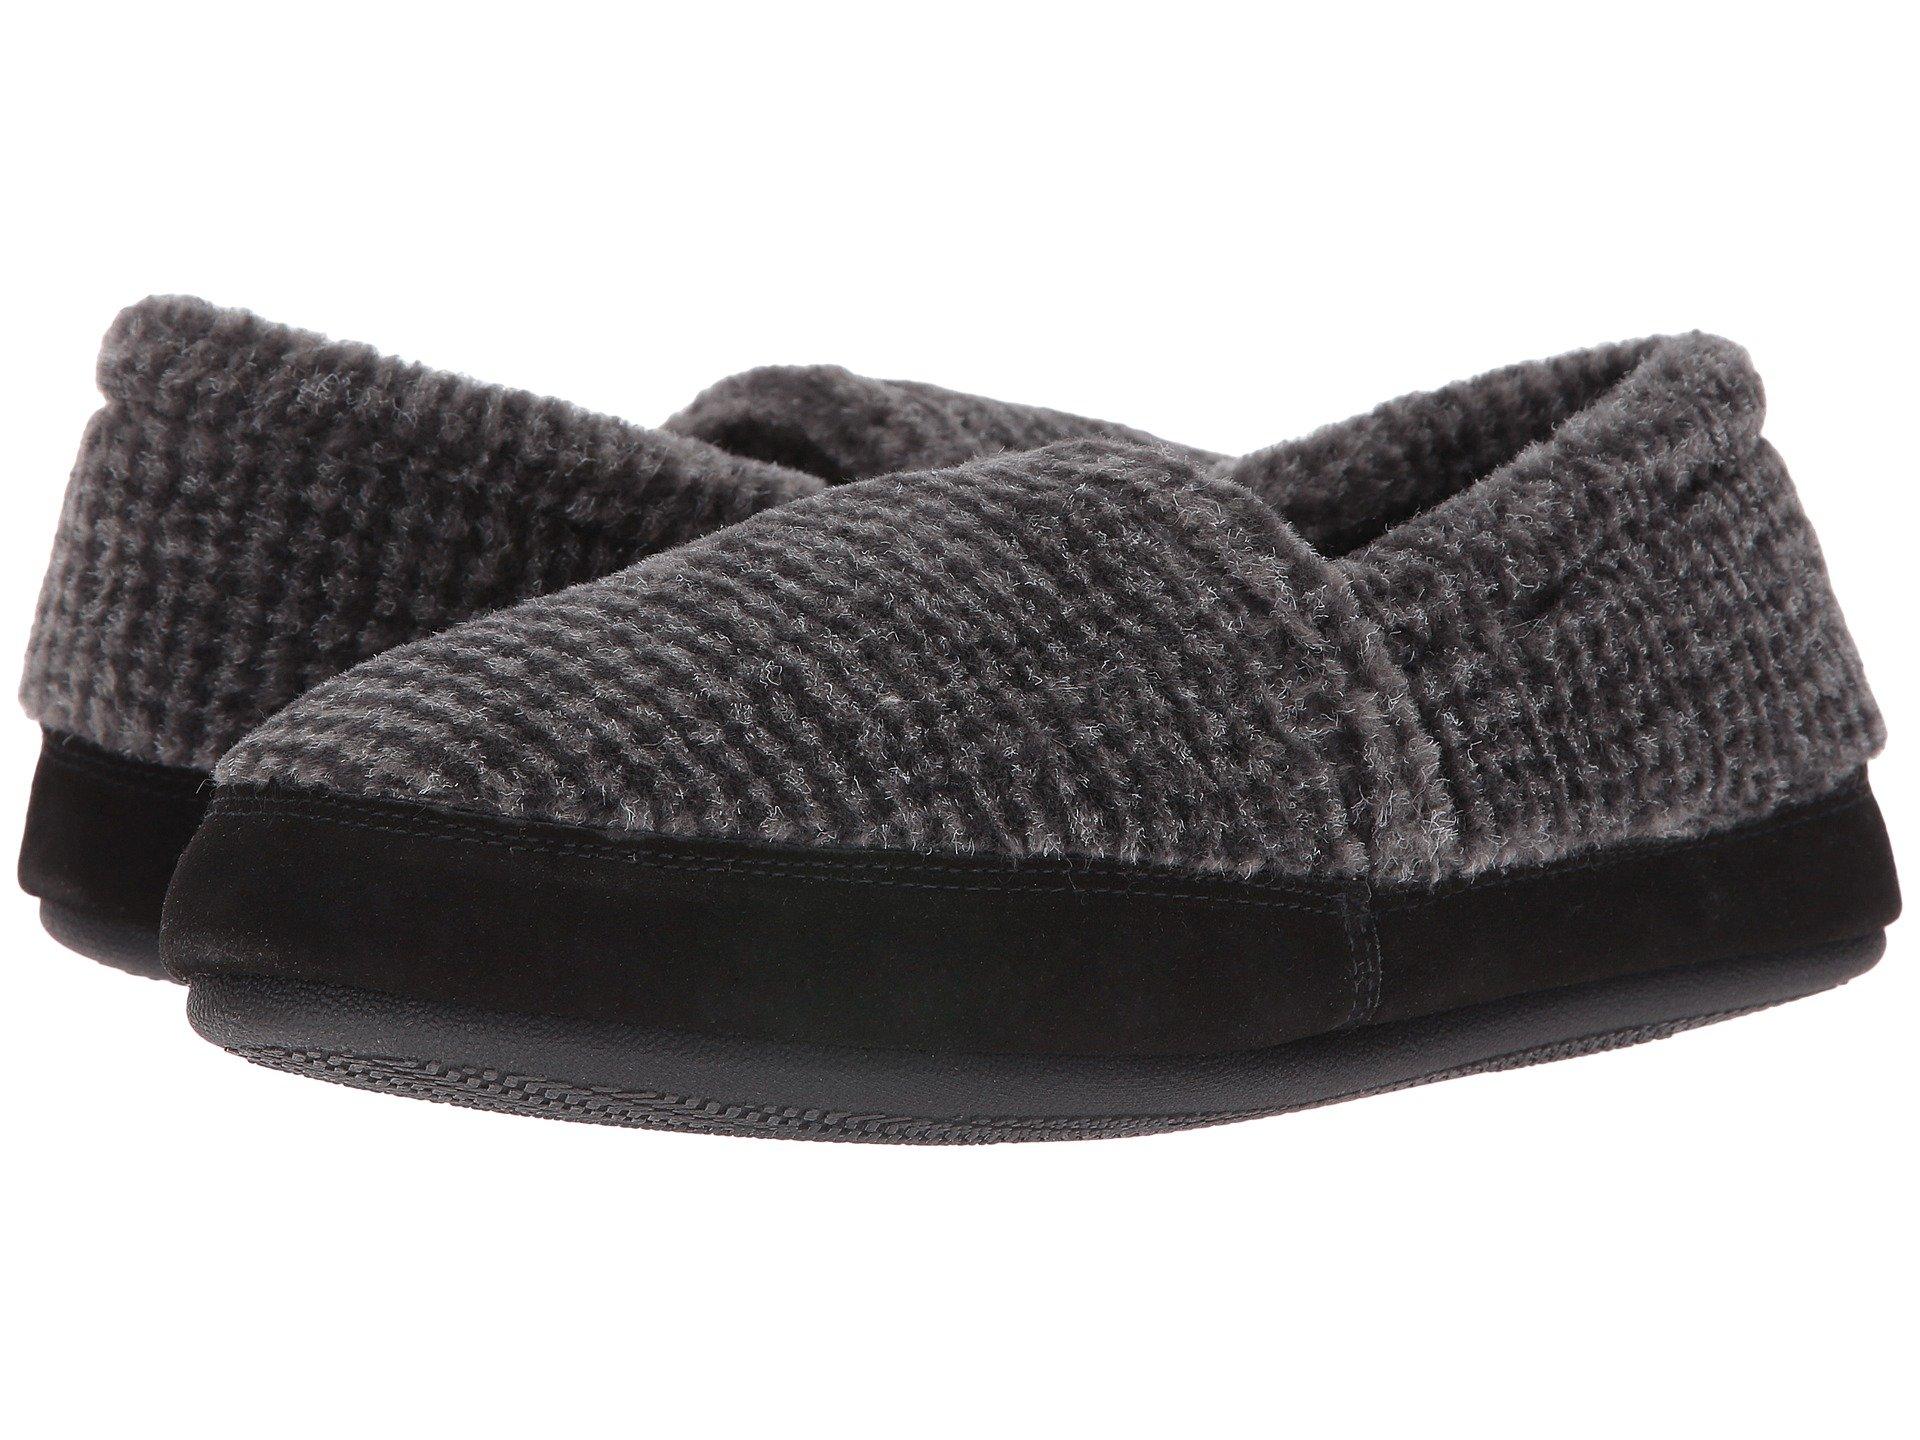 Zapatos de Descanso para Hombre Tempur-Pedic Stratus 2  + Tempur-Pedic en VeoyCompro.net